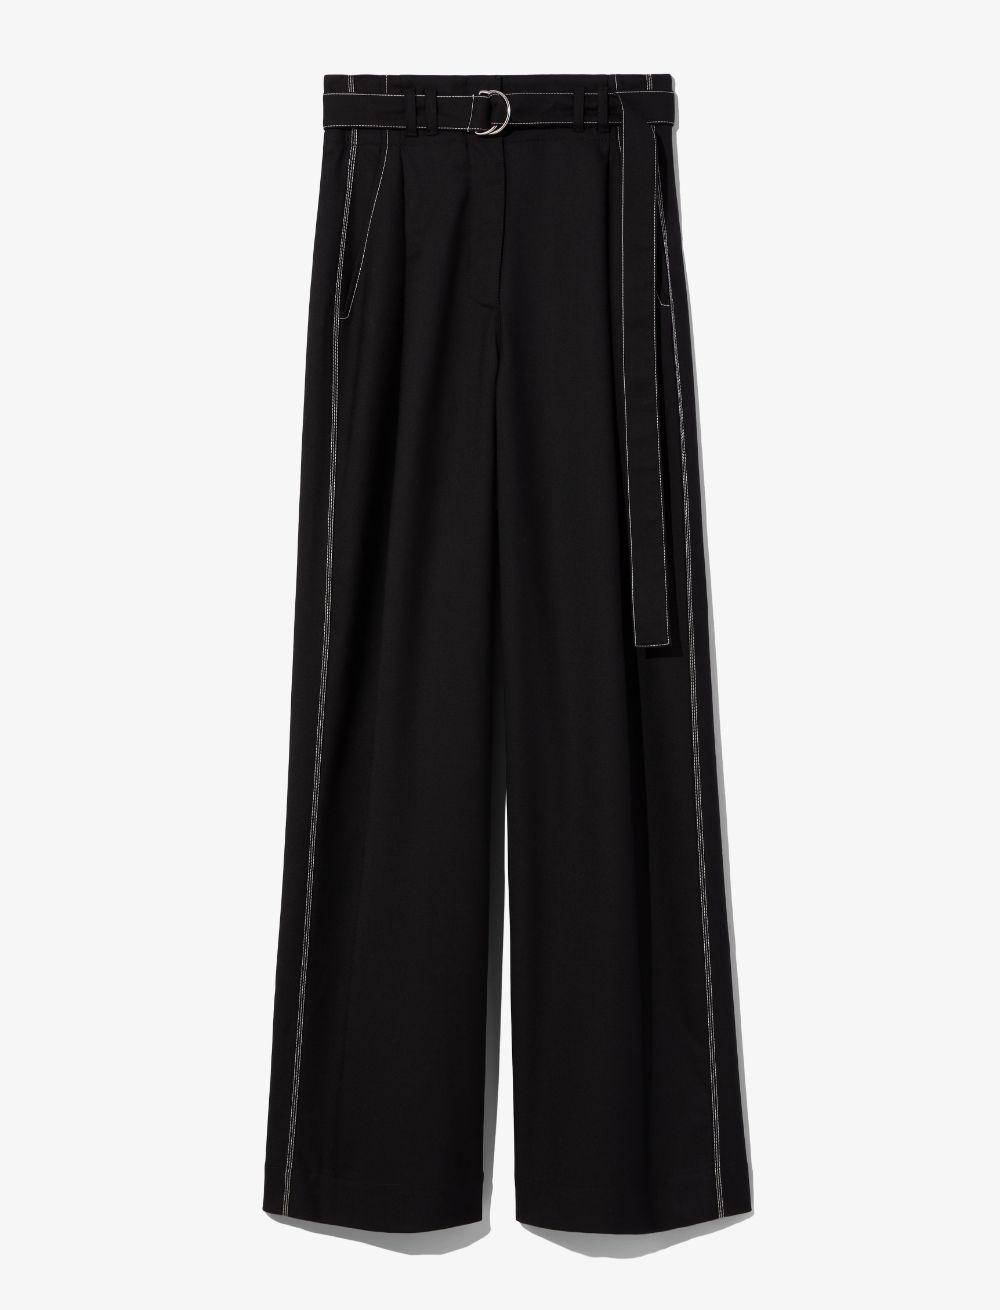 PROENZA SCHOULER | Pantalone | WL2046019AY12000200